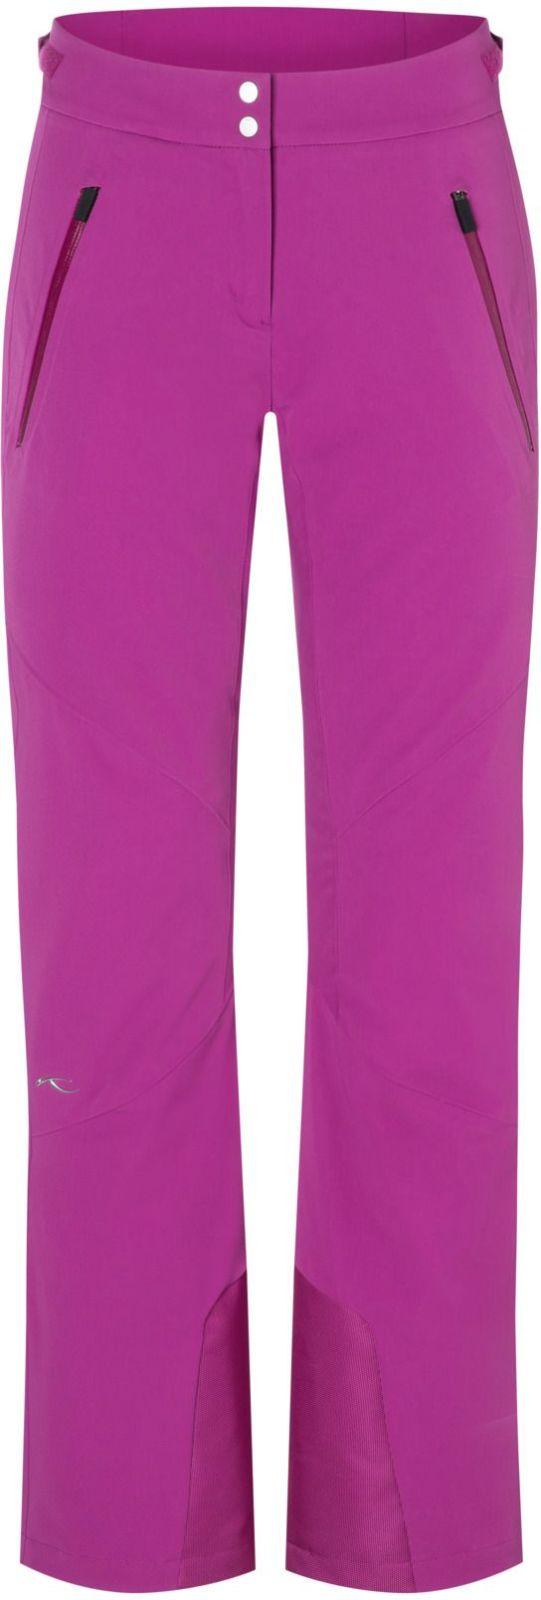 Kjus Women Formula Pants - fruity pink S